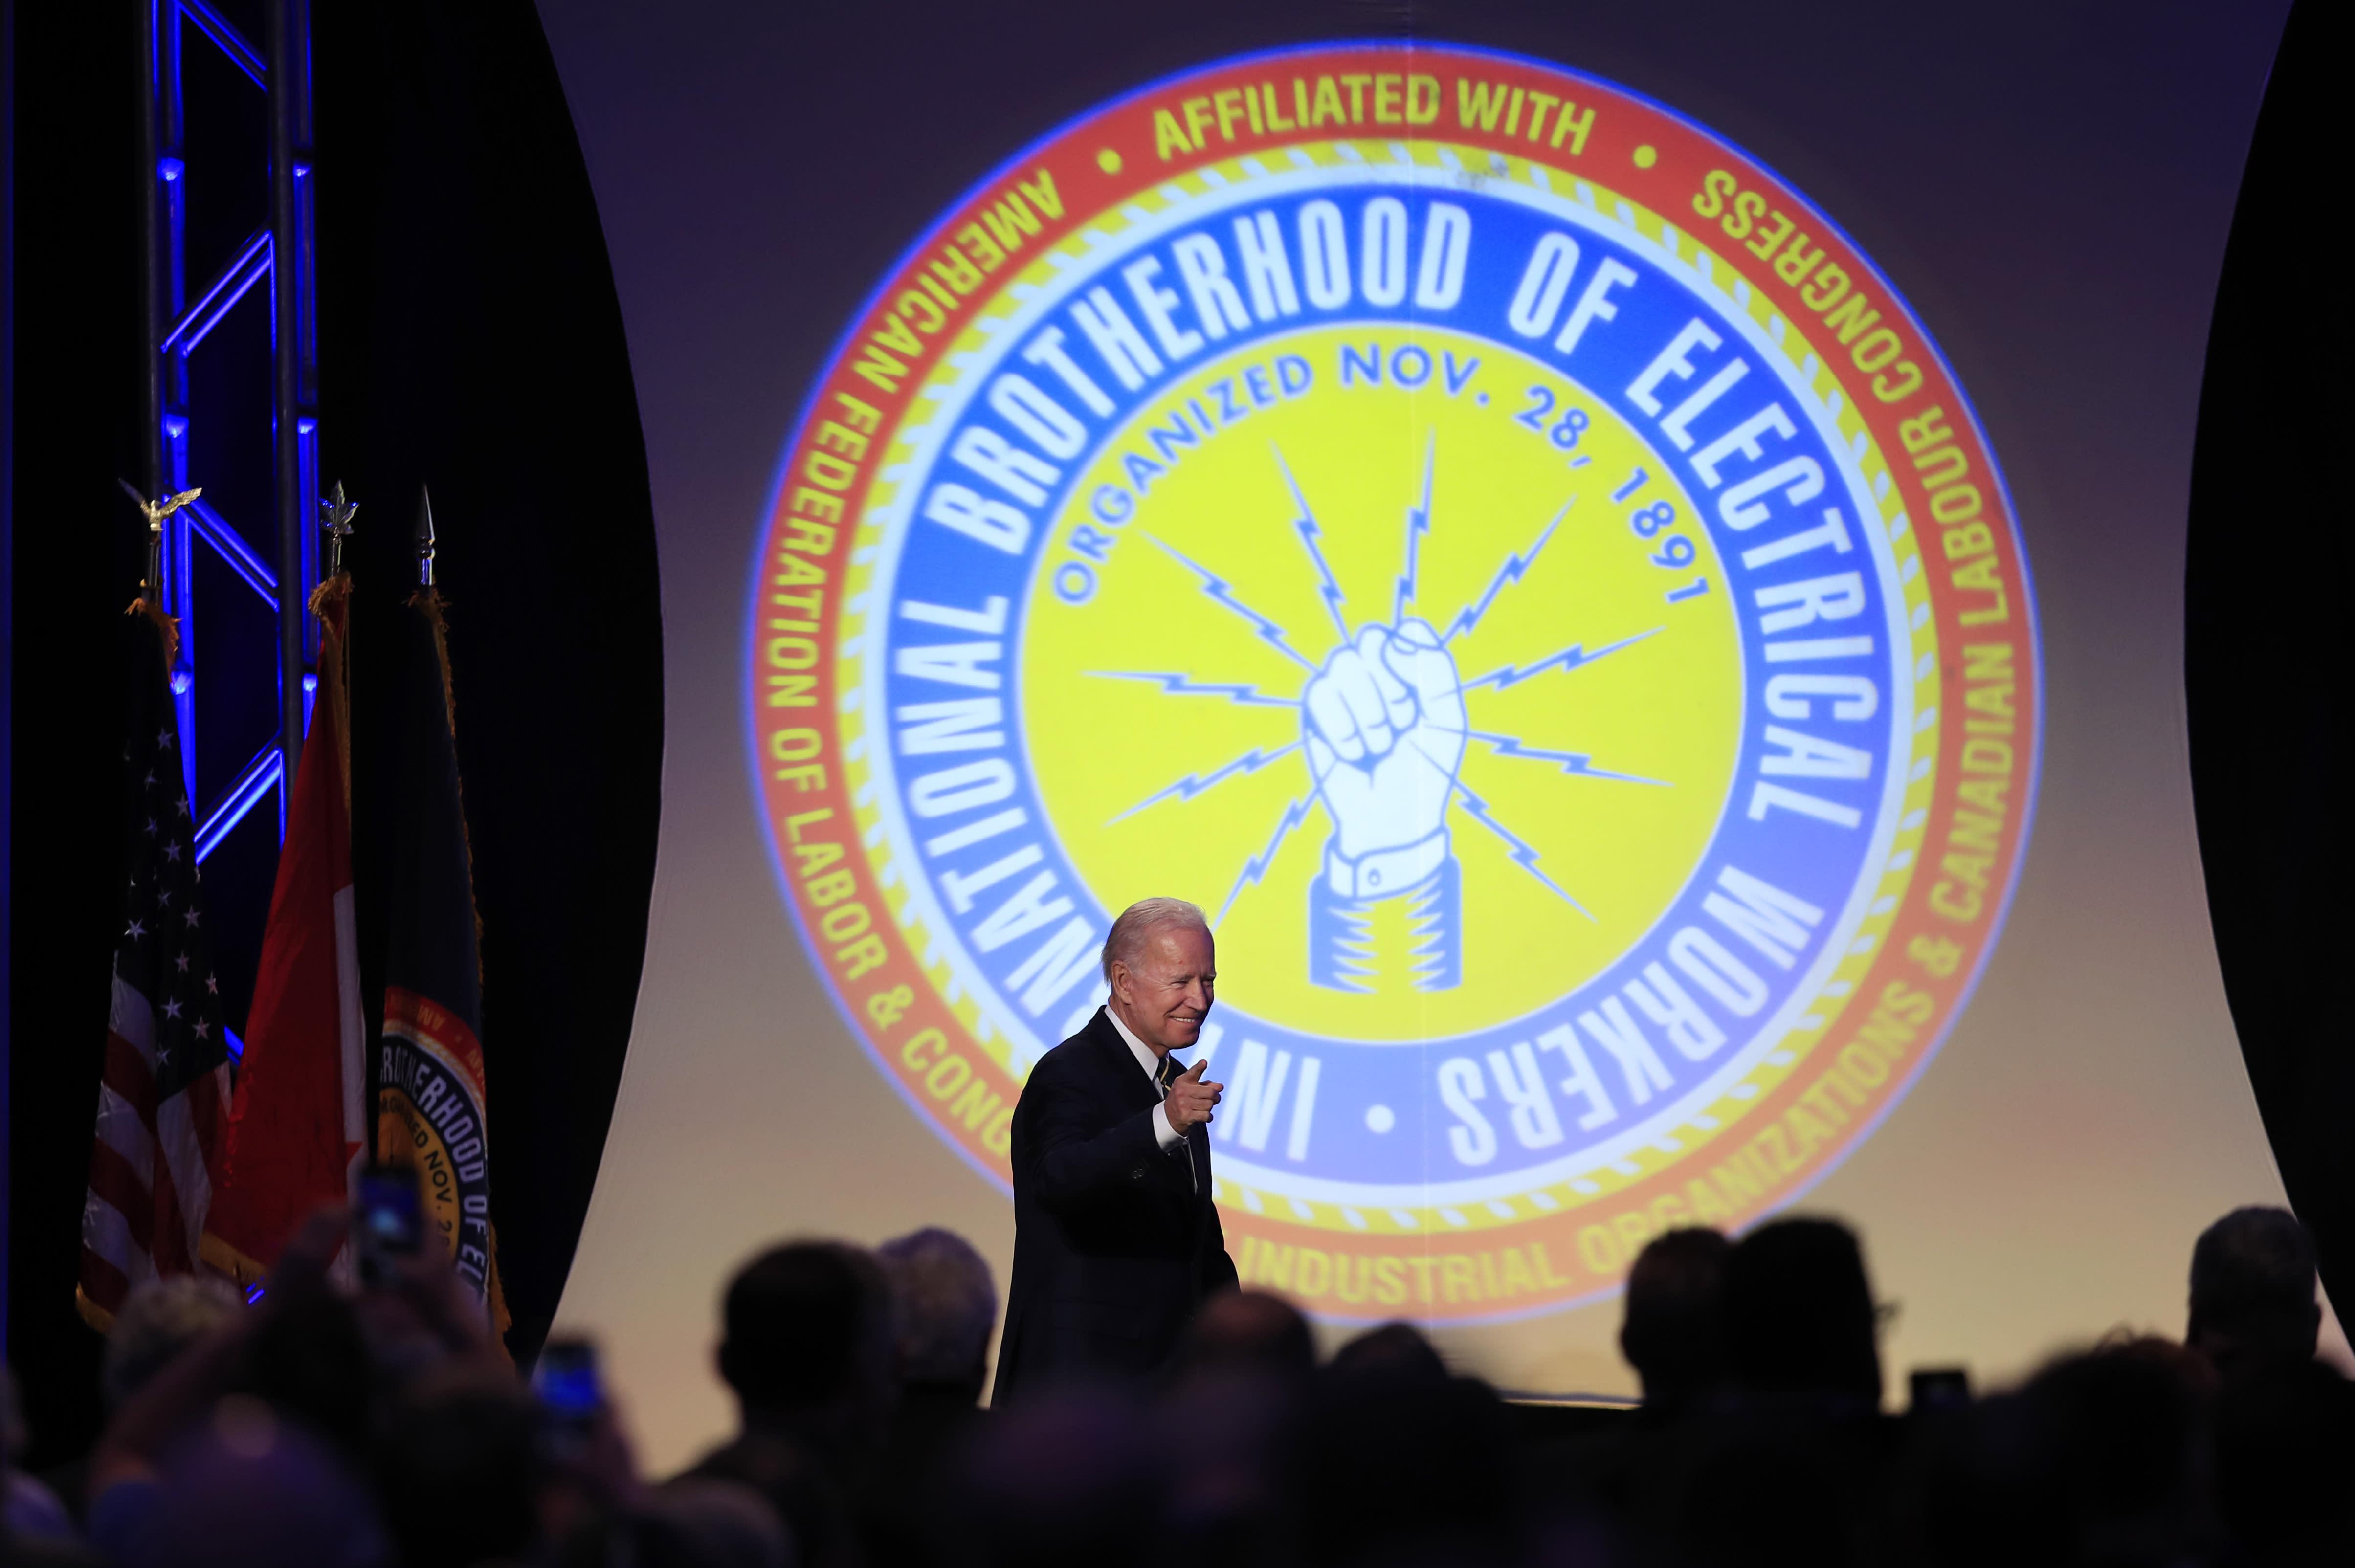 QnA VBage The Latest: Biden 'an Obama-Biden Democrat' and proud of it